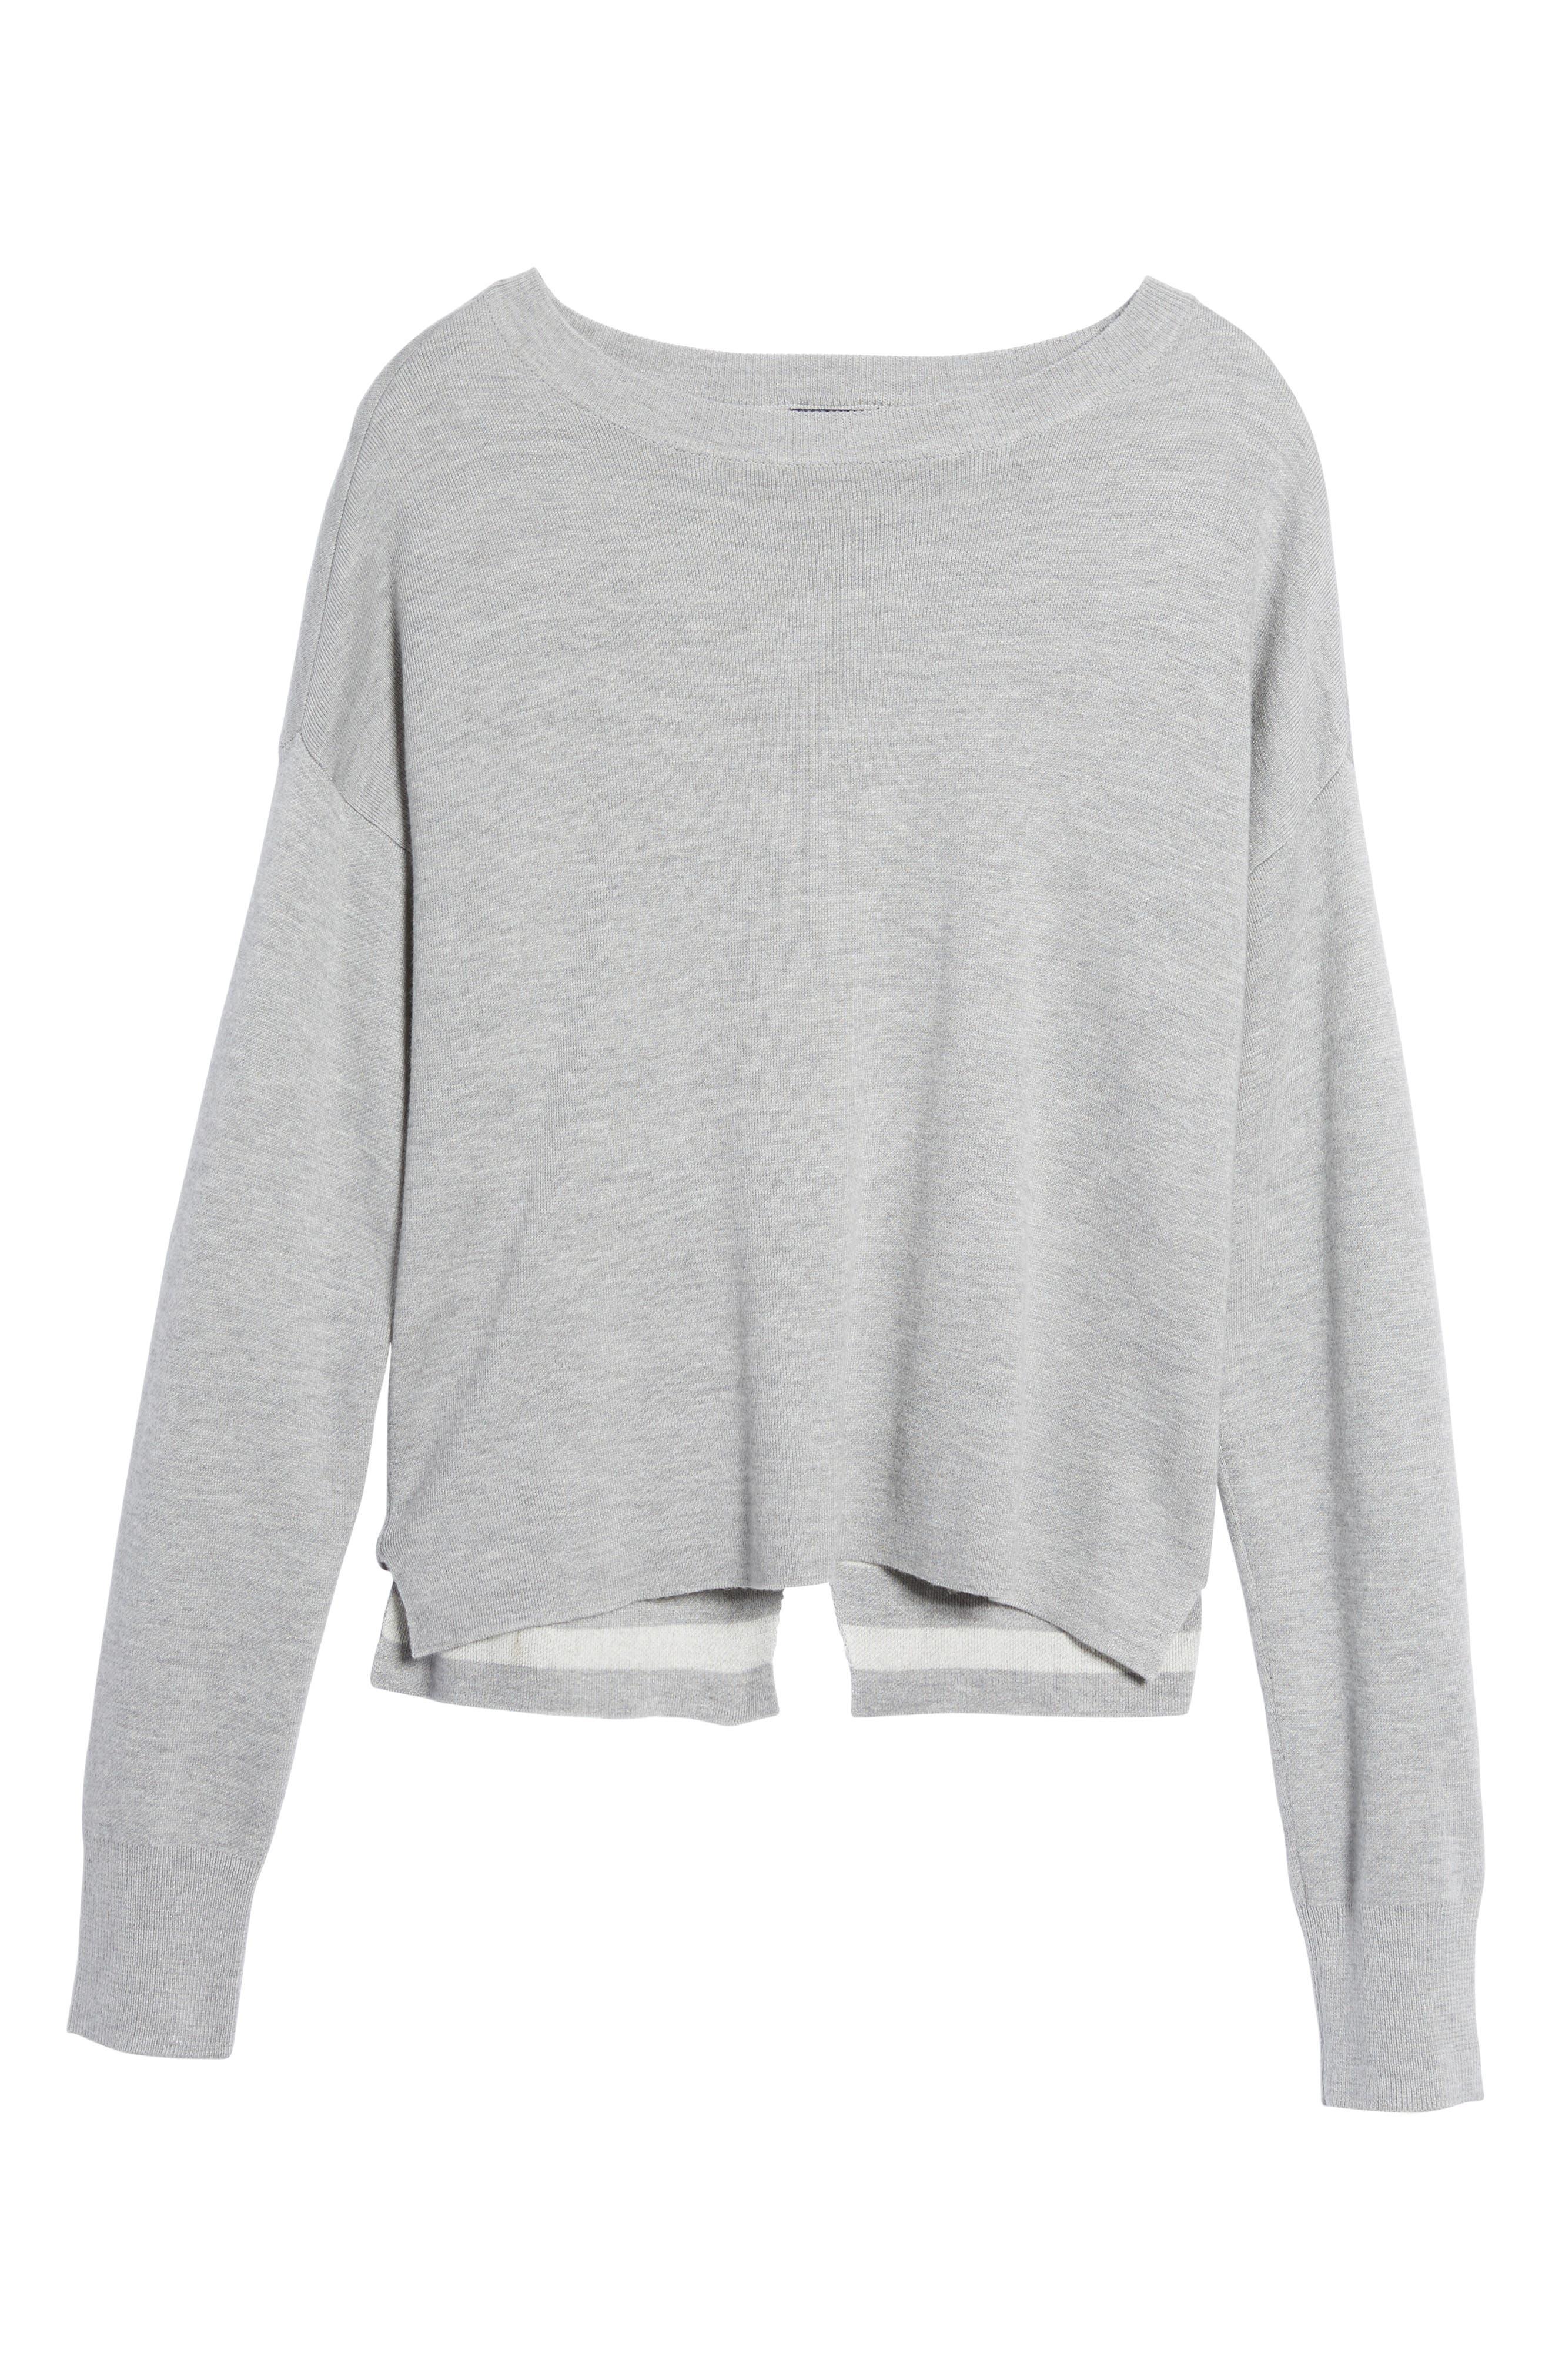 Devon Crossback Sweater,                             Alternate thumbnail 6, color,                             Light Heather Grey